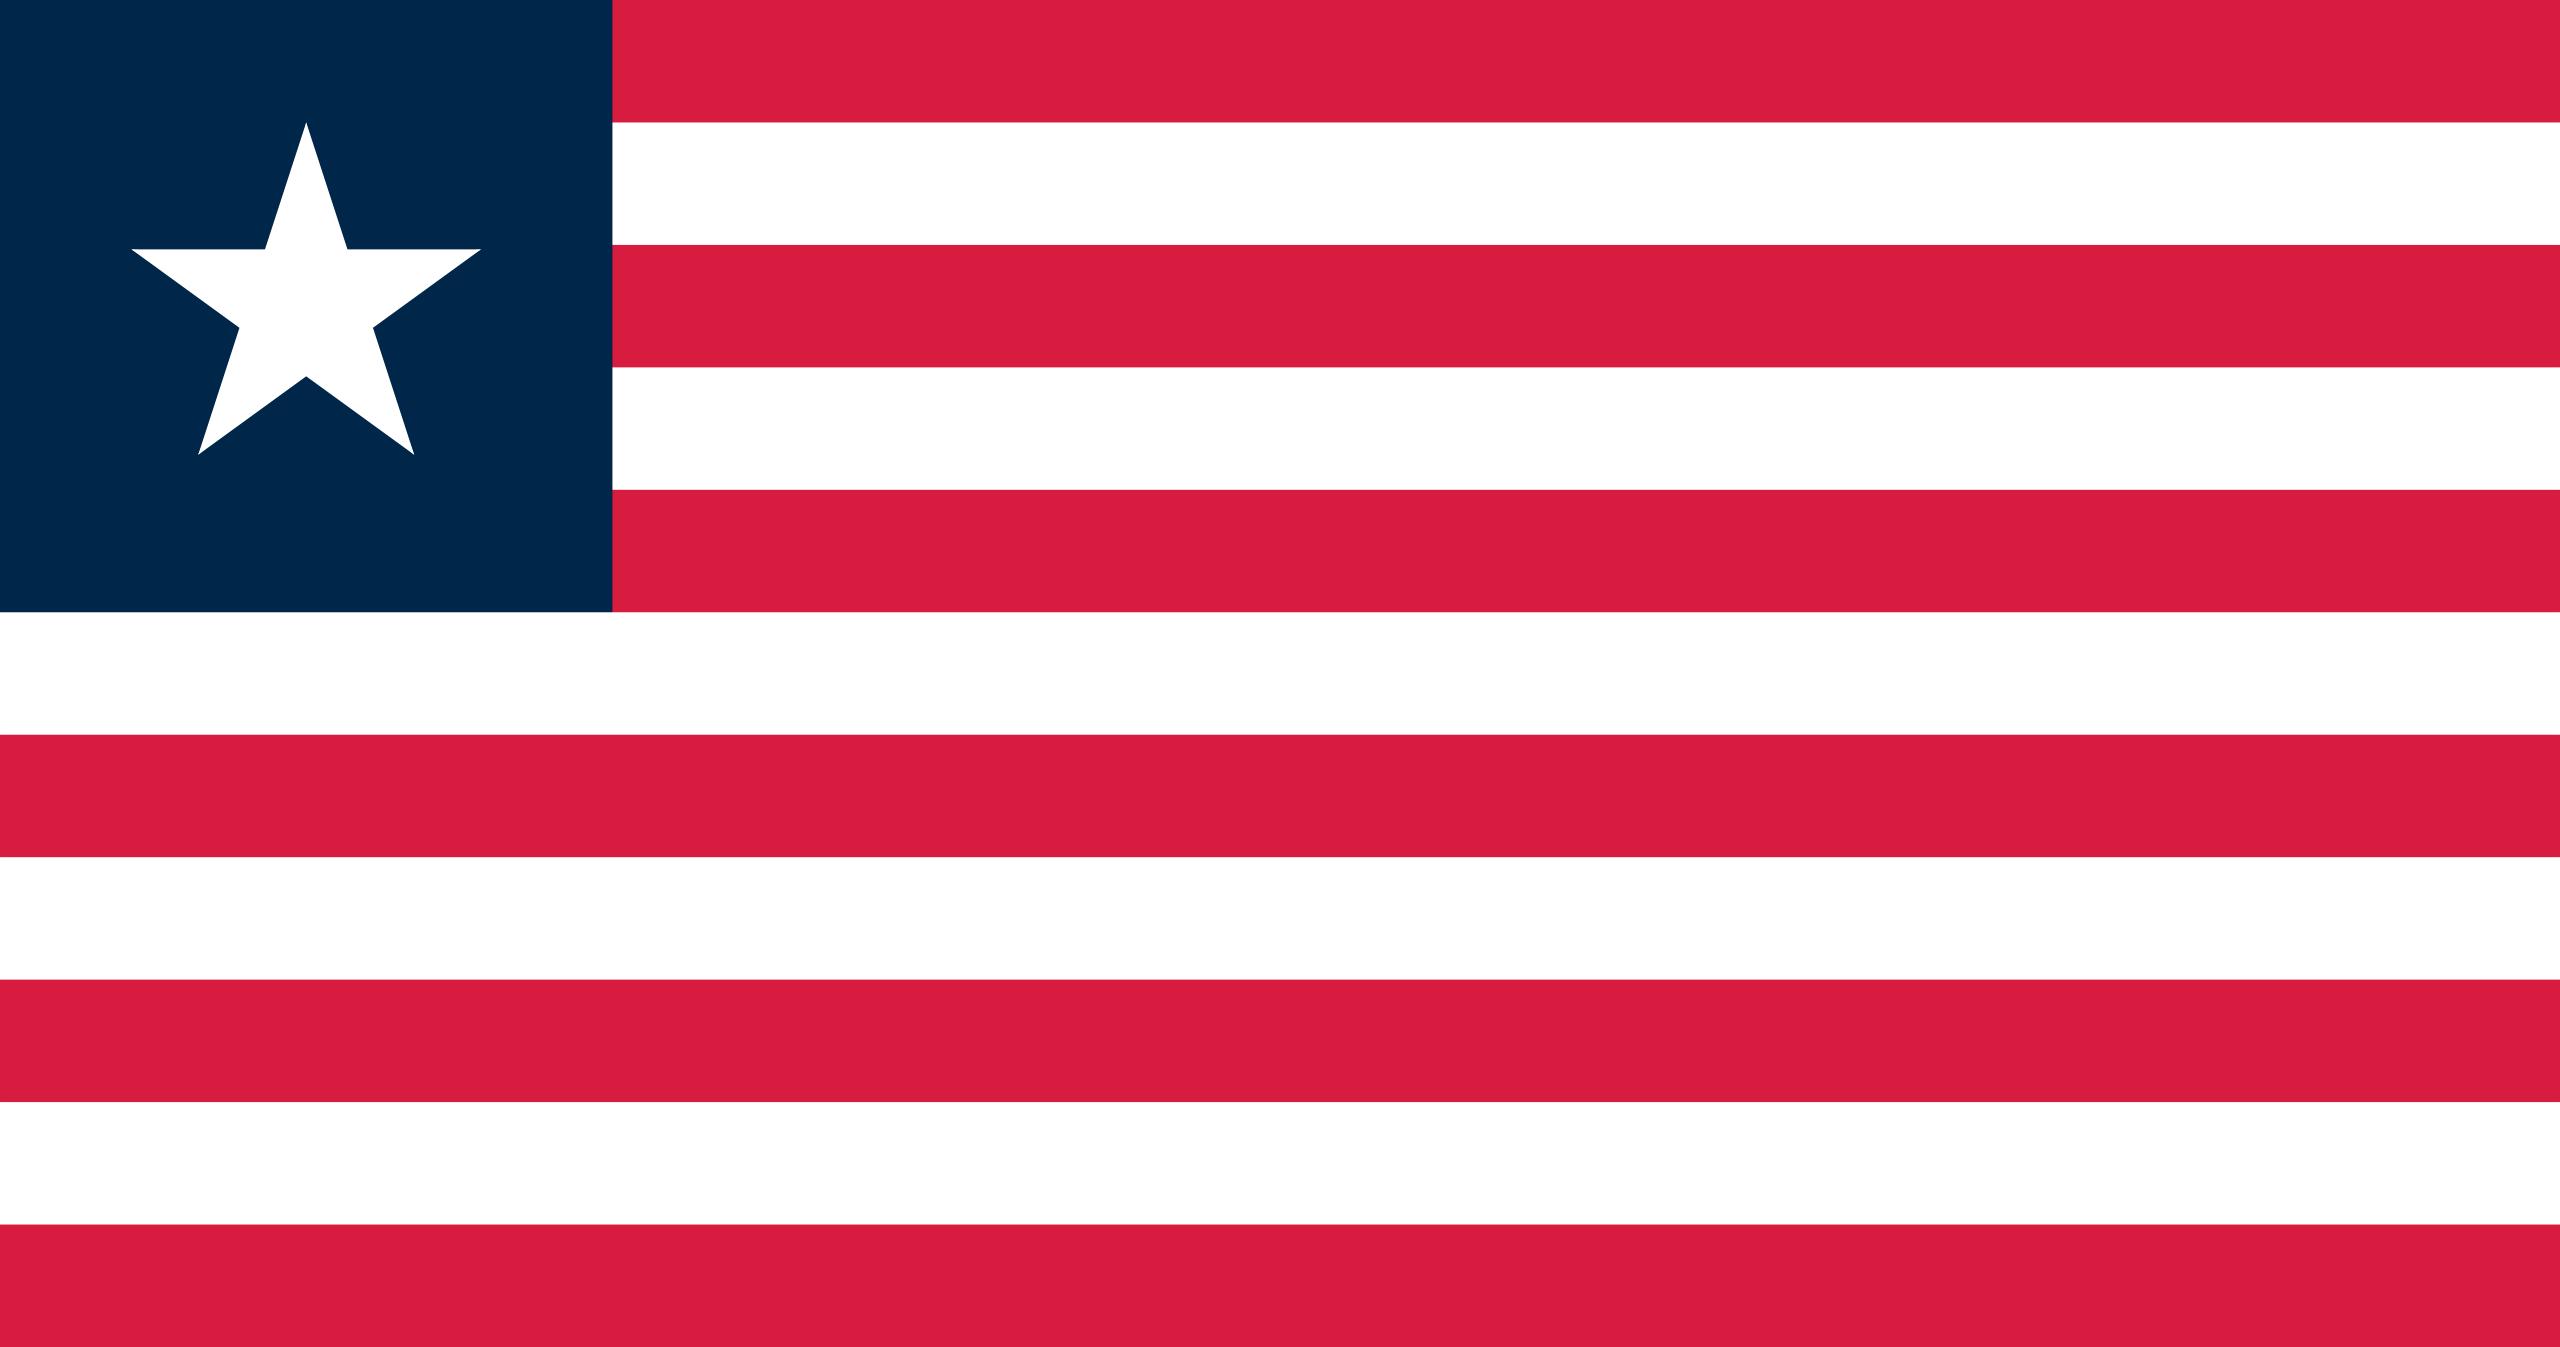 liberia, देश, emblema, लोग�प्रतीकbolo - HD वॉलपेपर - प्रोफेसर-falken.com